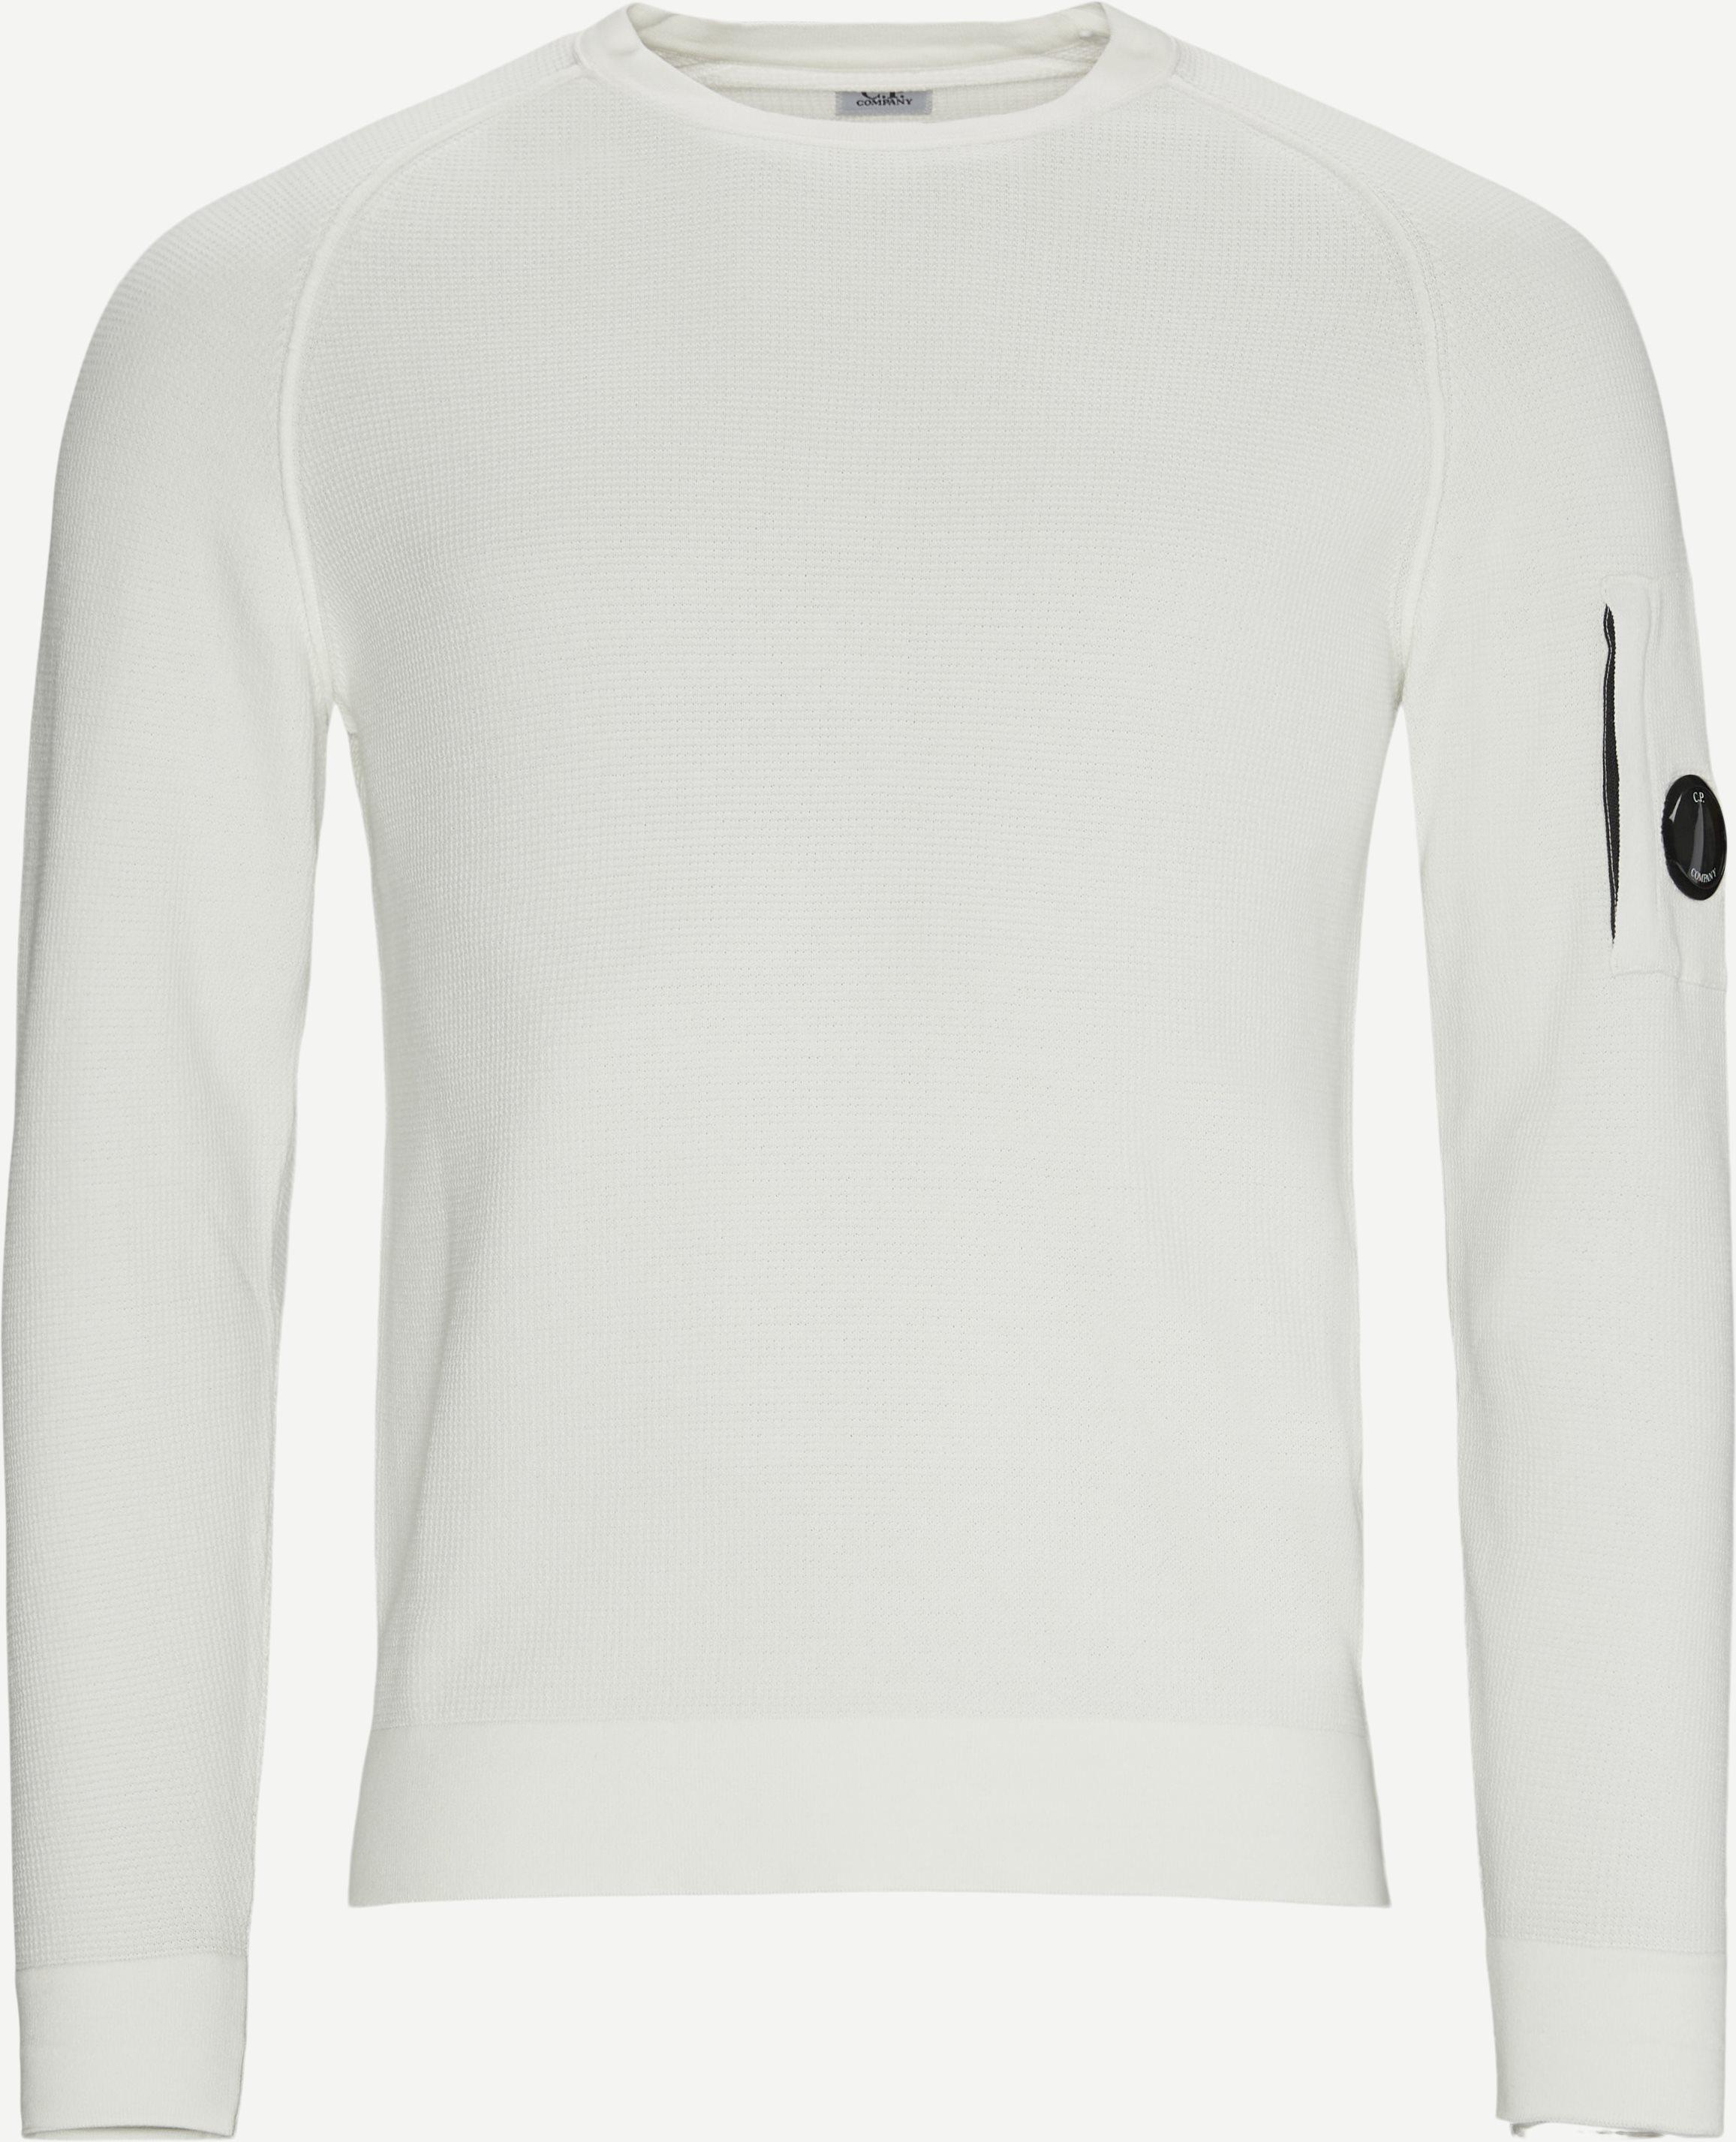 Strickwaren - Regular - Weiß